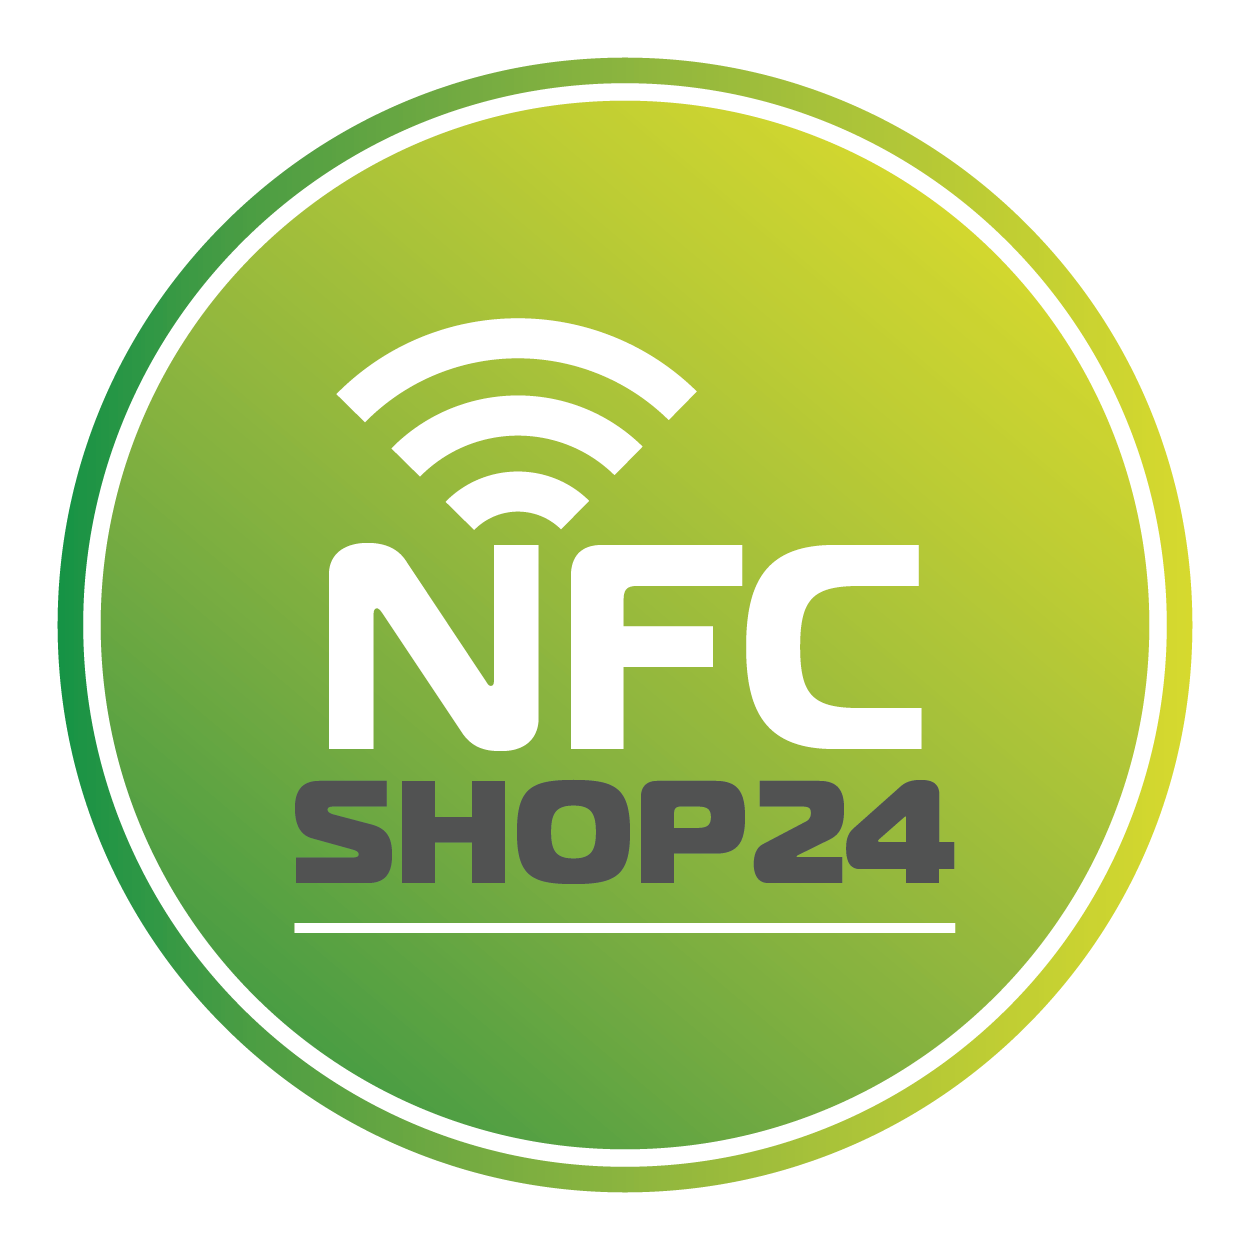 Nfc Shop24de Nfc Produkte Günstig Kaufen